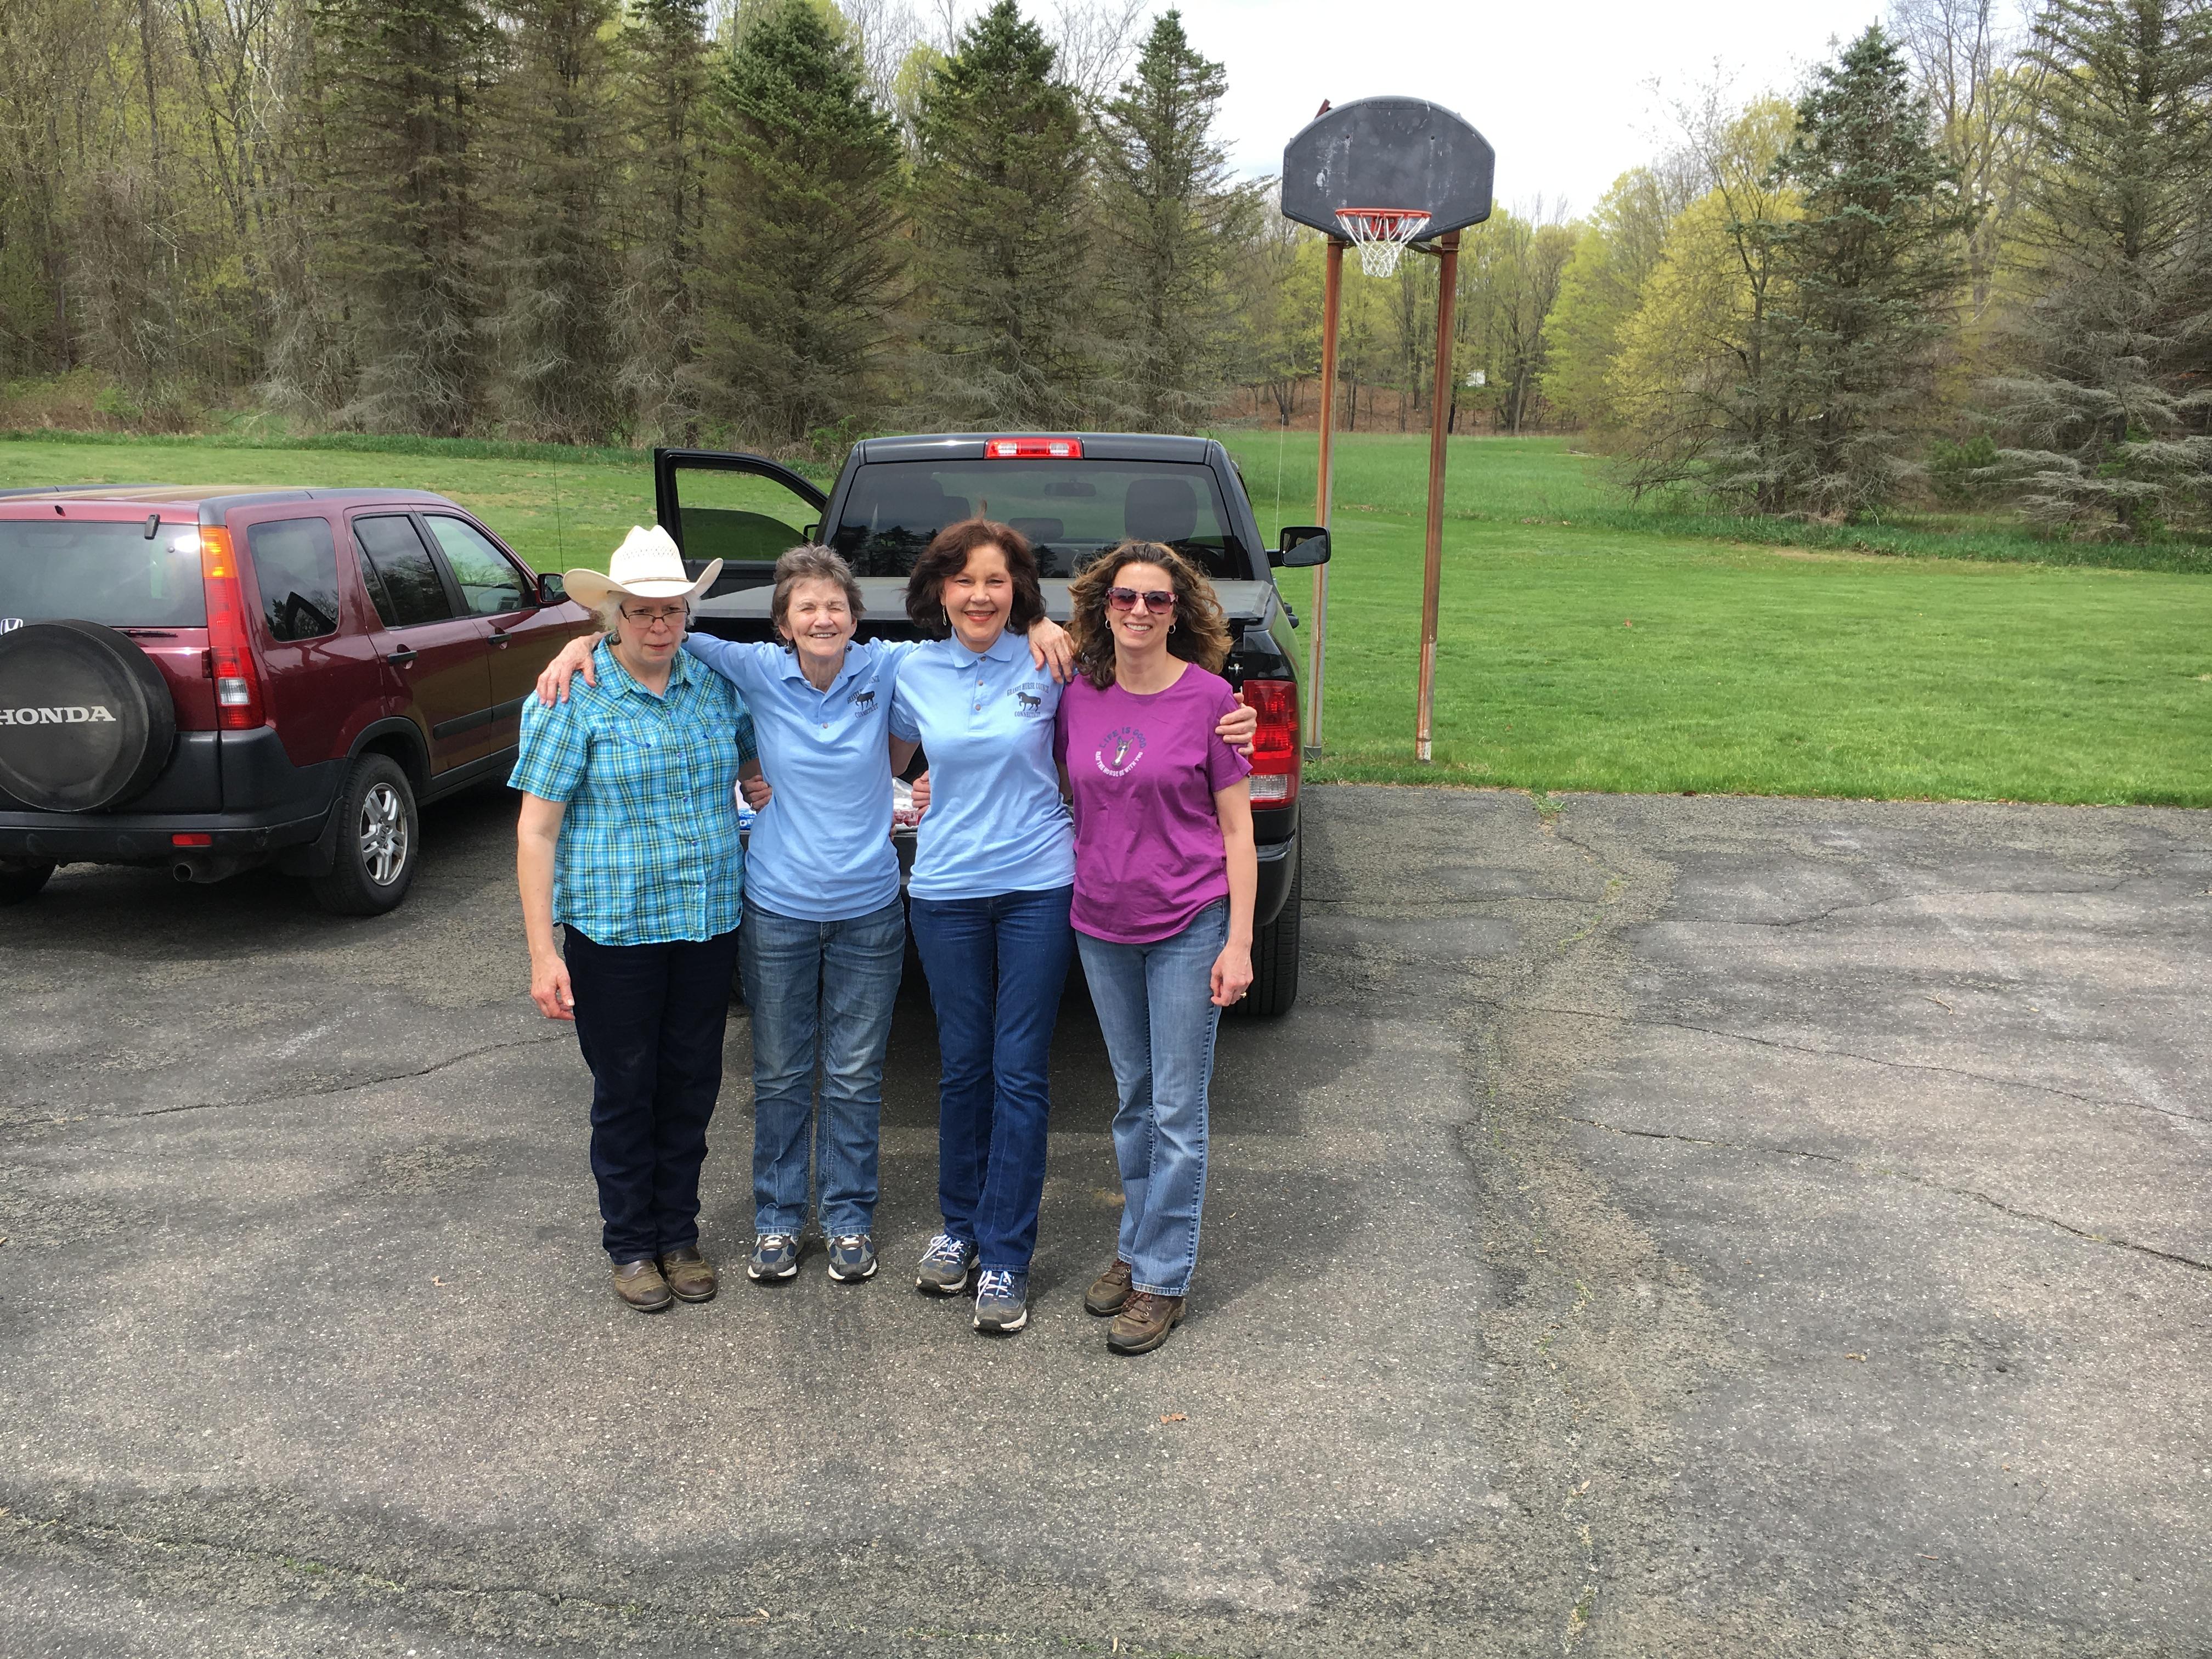 Allison, Bonnie, Kathy & Sherry